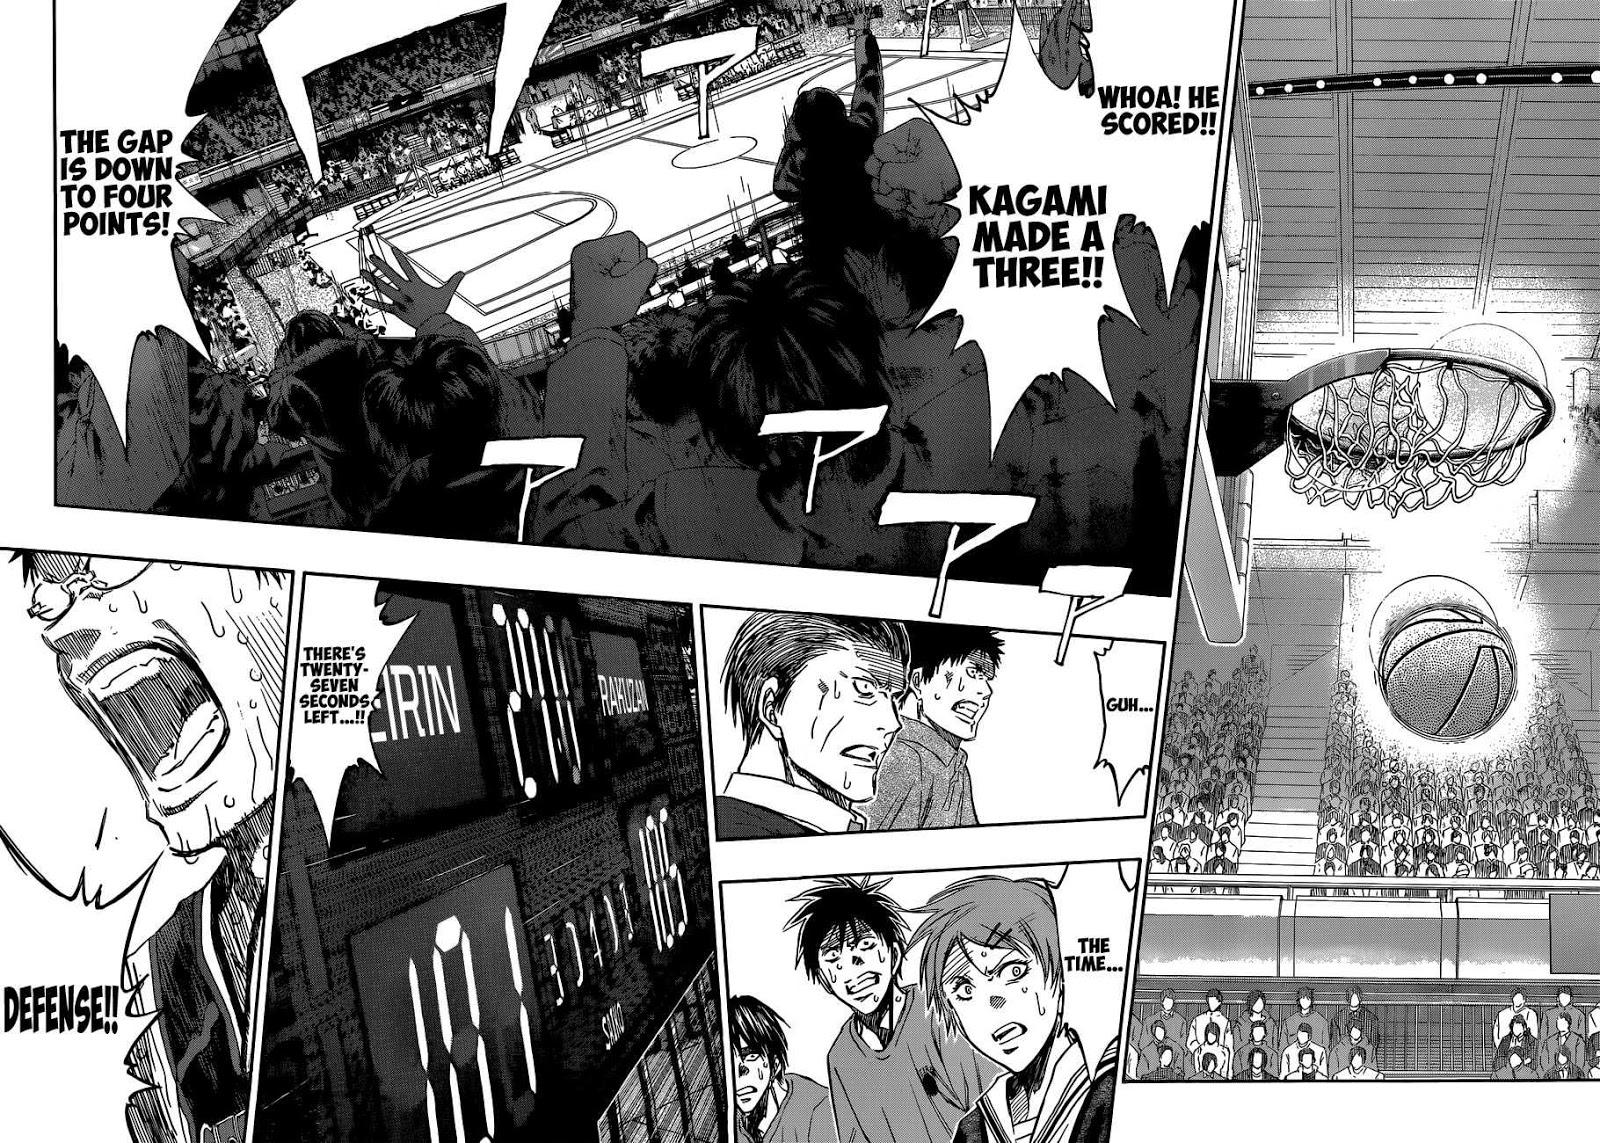 Kuroko no Basket Manga Chapter 272 - Image 10-11